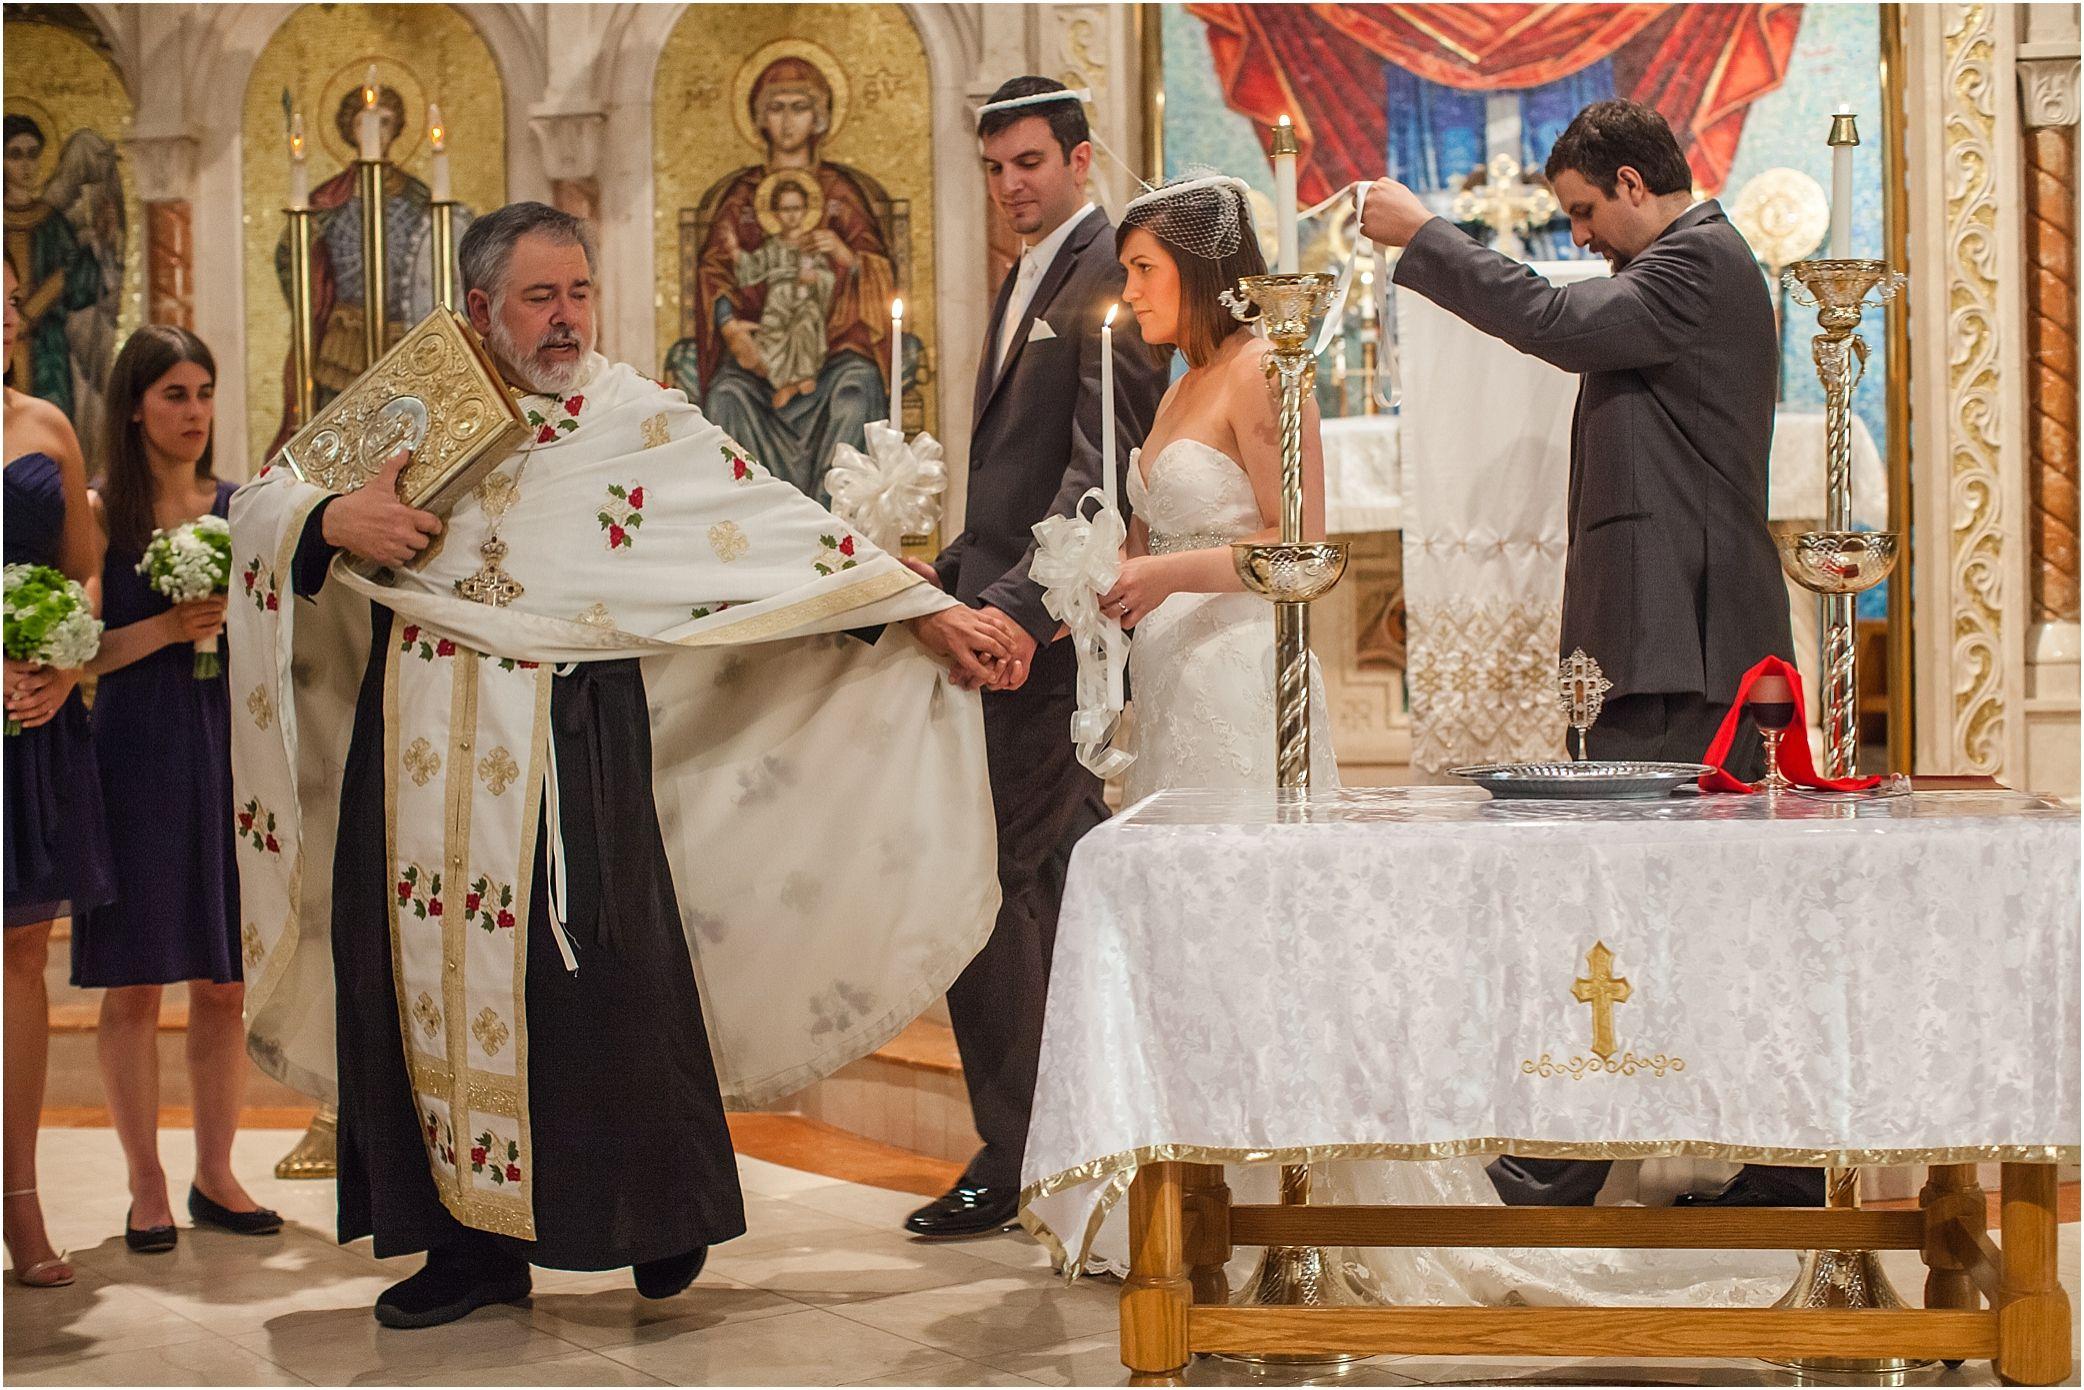 Pin By Vetta Kelepouris Agnos On Paradosiakos Ellhnikos Gamos Greek Wedding Greek Wedding Traditions Orthodox Wedding